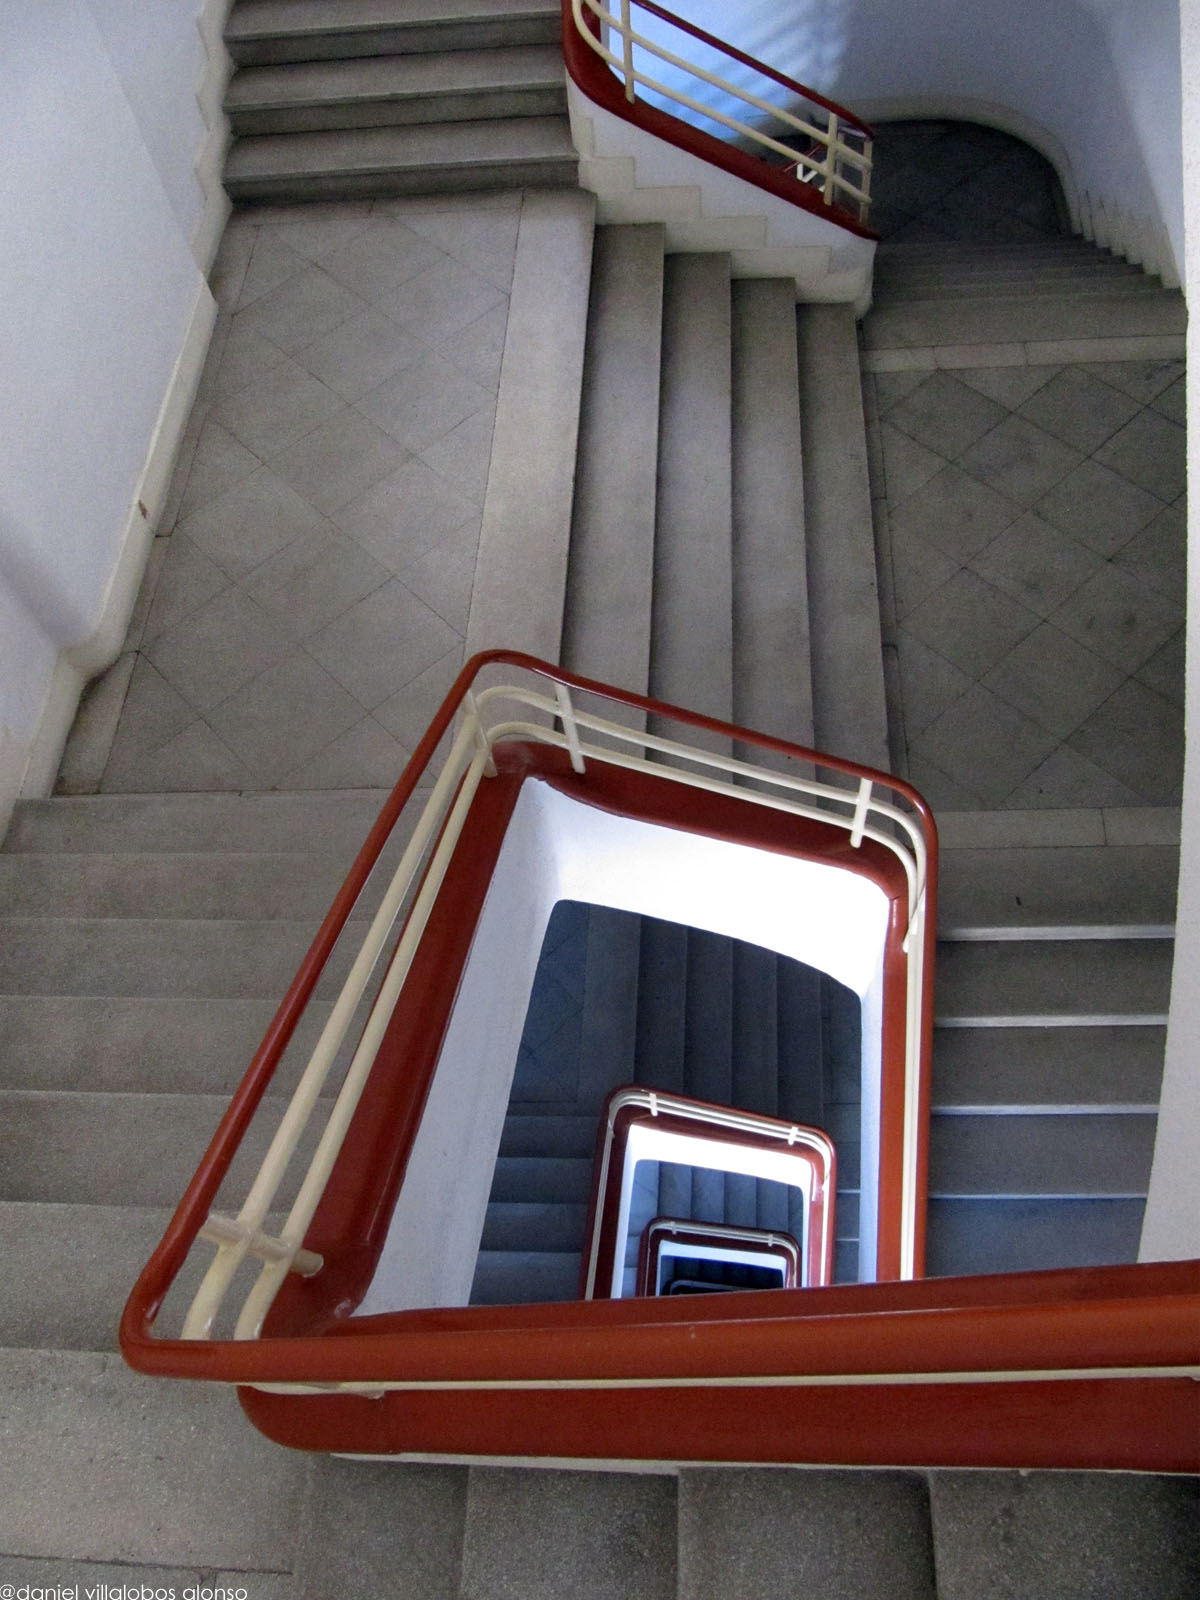 danielvillalobos-cines-digitalphotographies-modernarchitecture-12